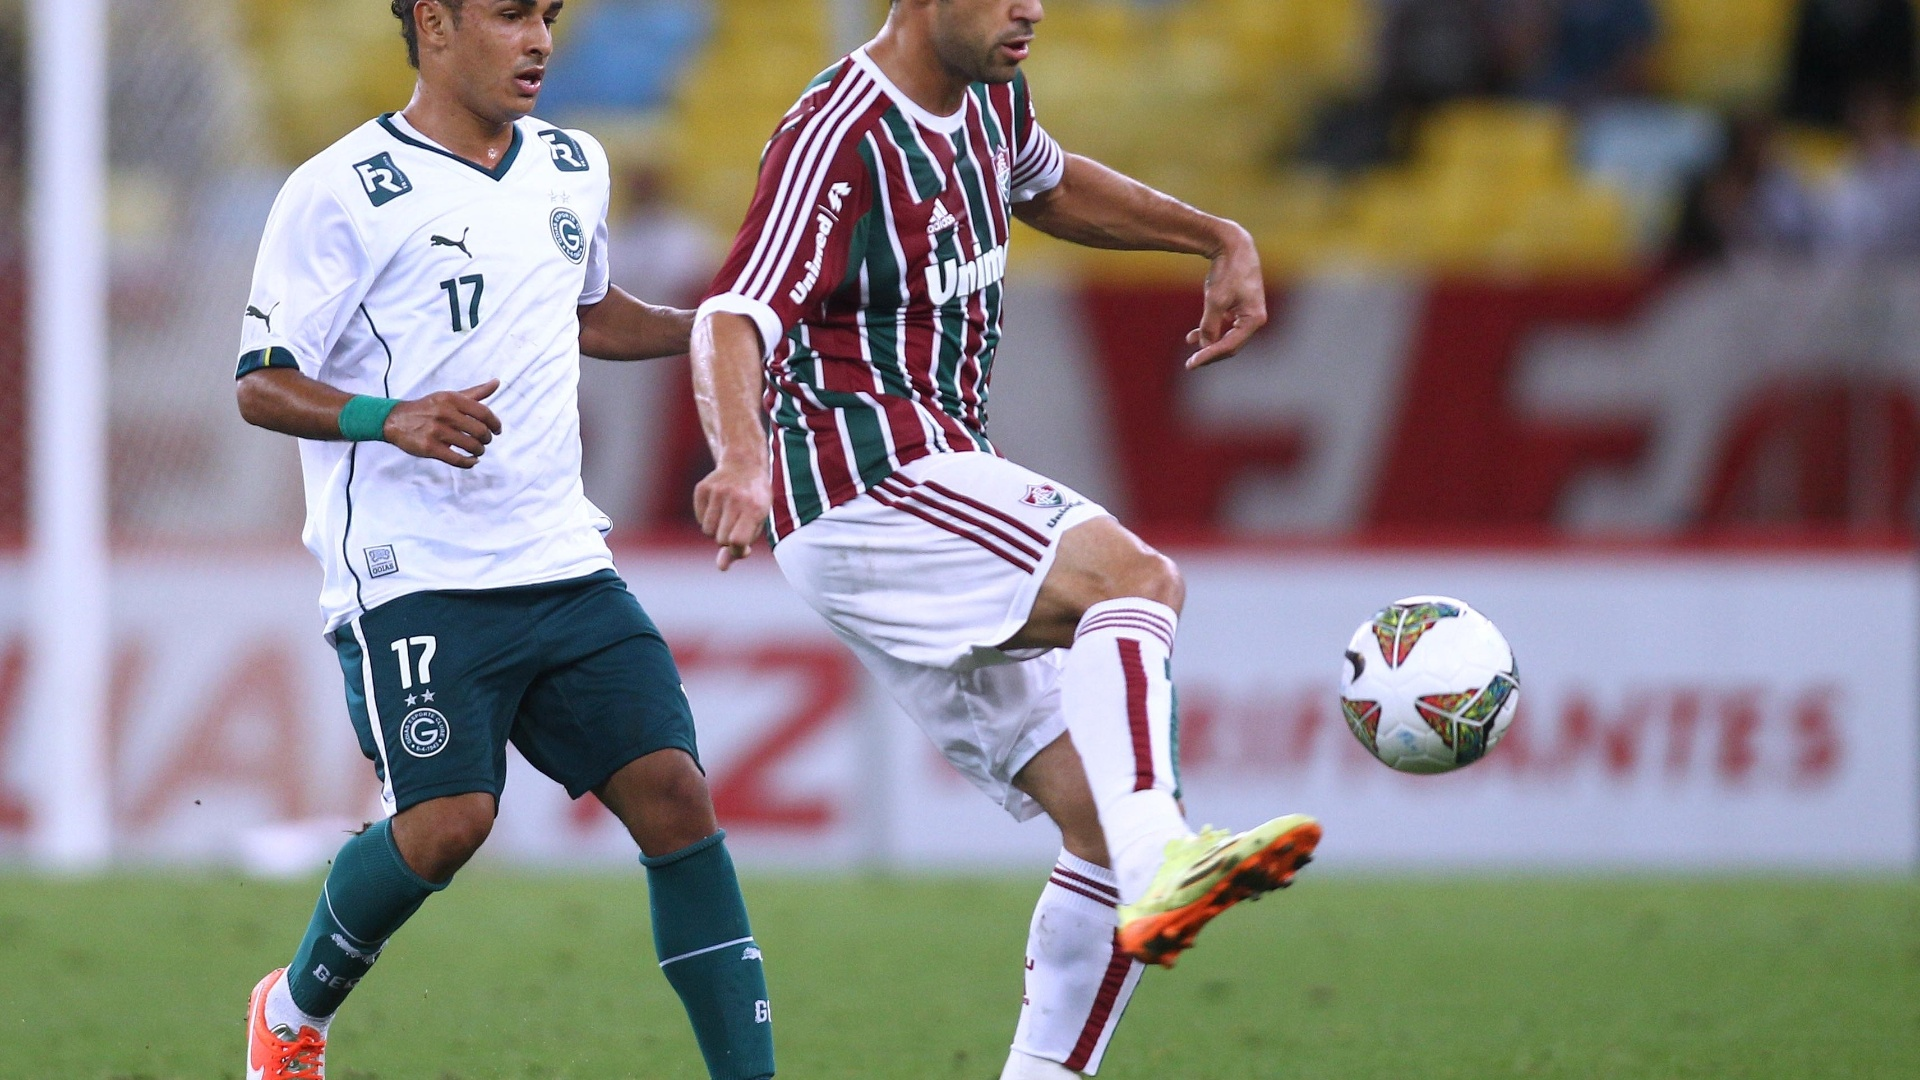 Fred domina a bola na partida entre Fluminense e Goiás pela Sul-Americana